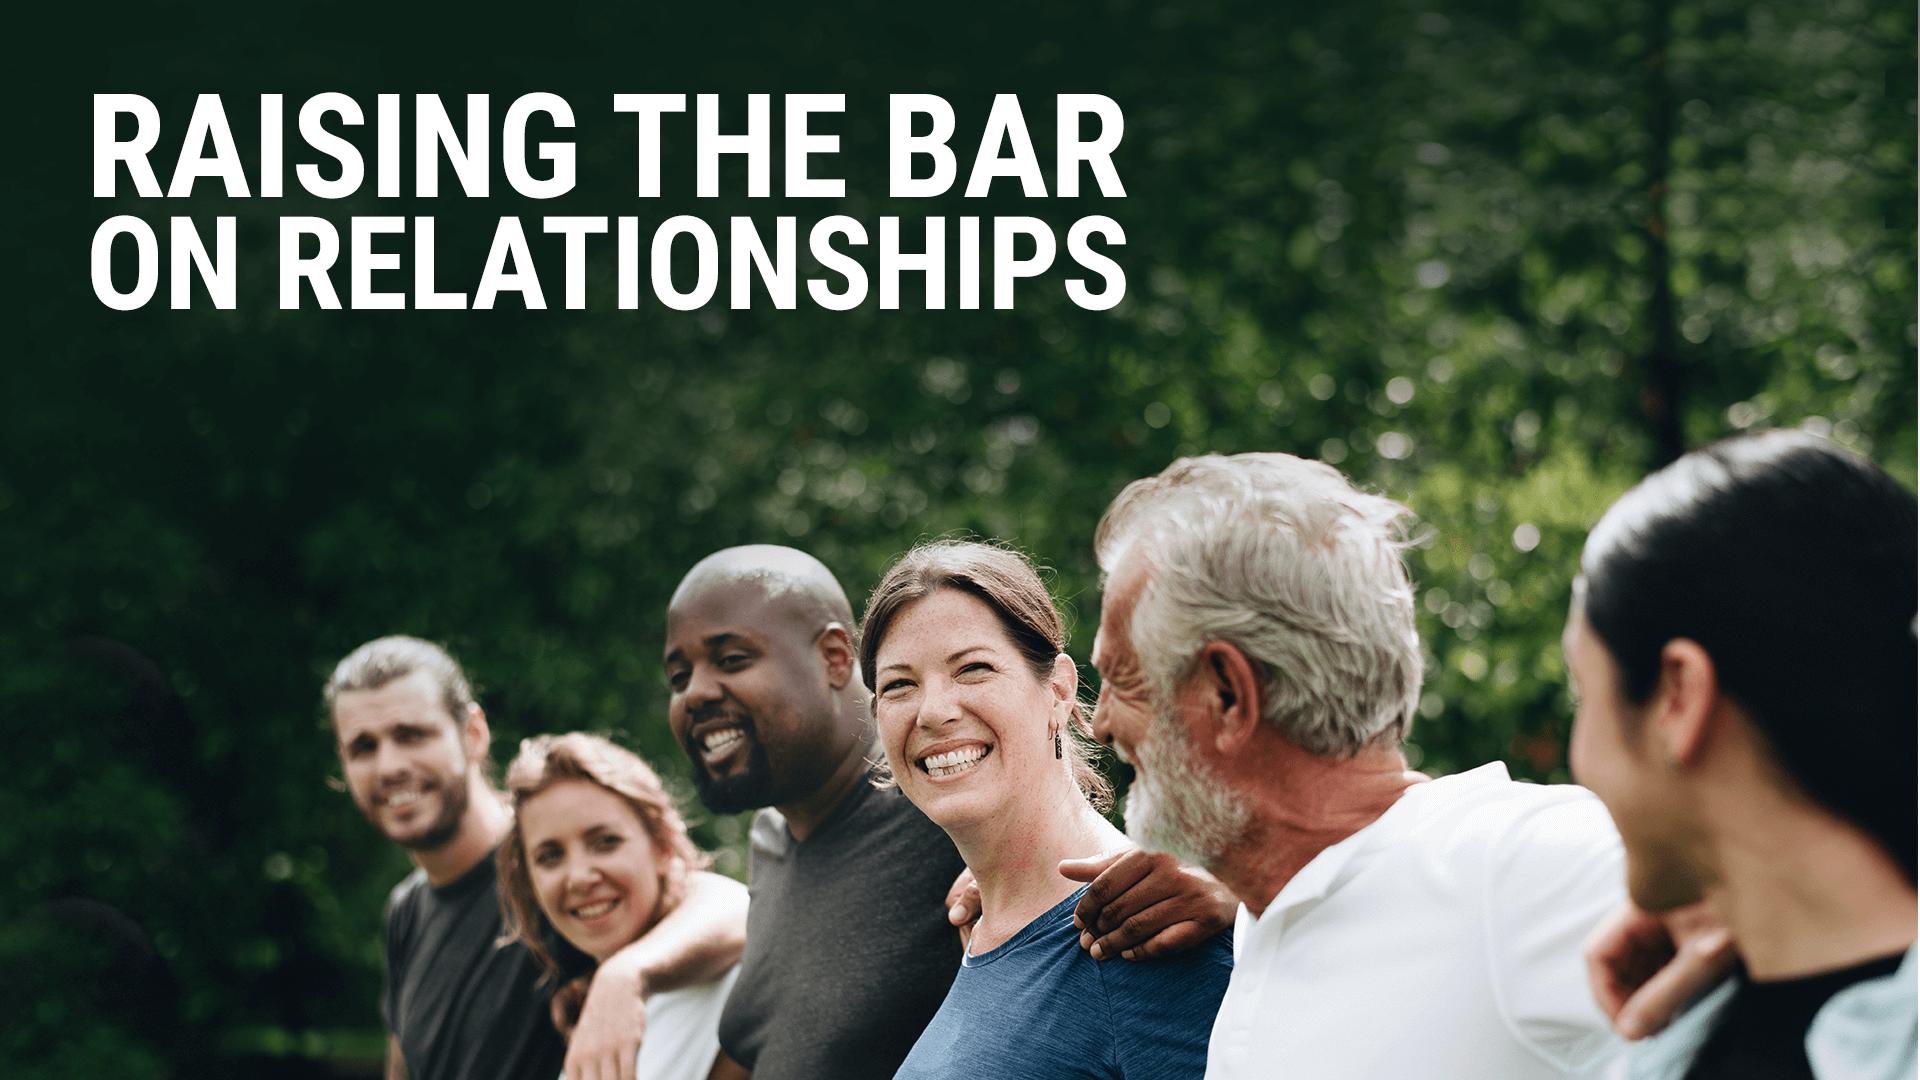 Raising the Bar on Relationships